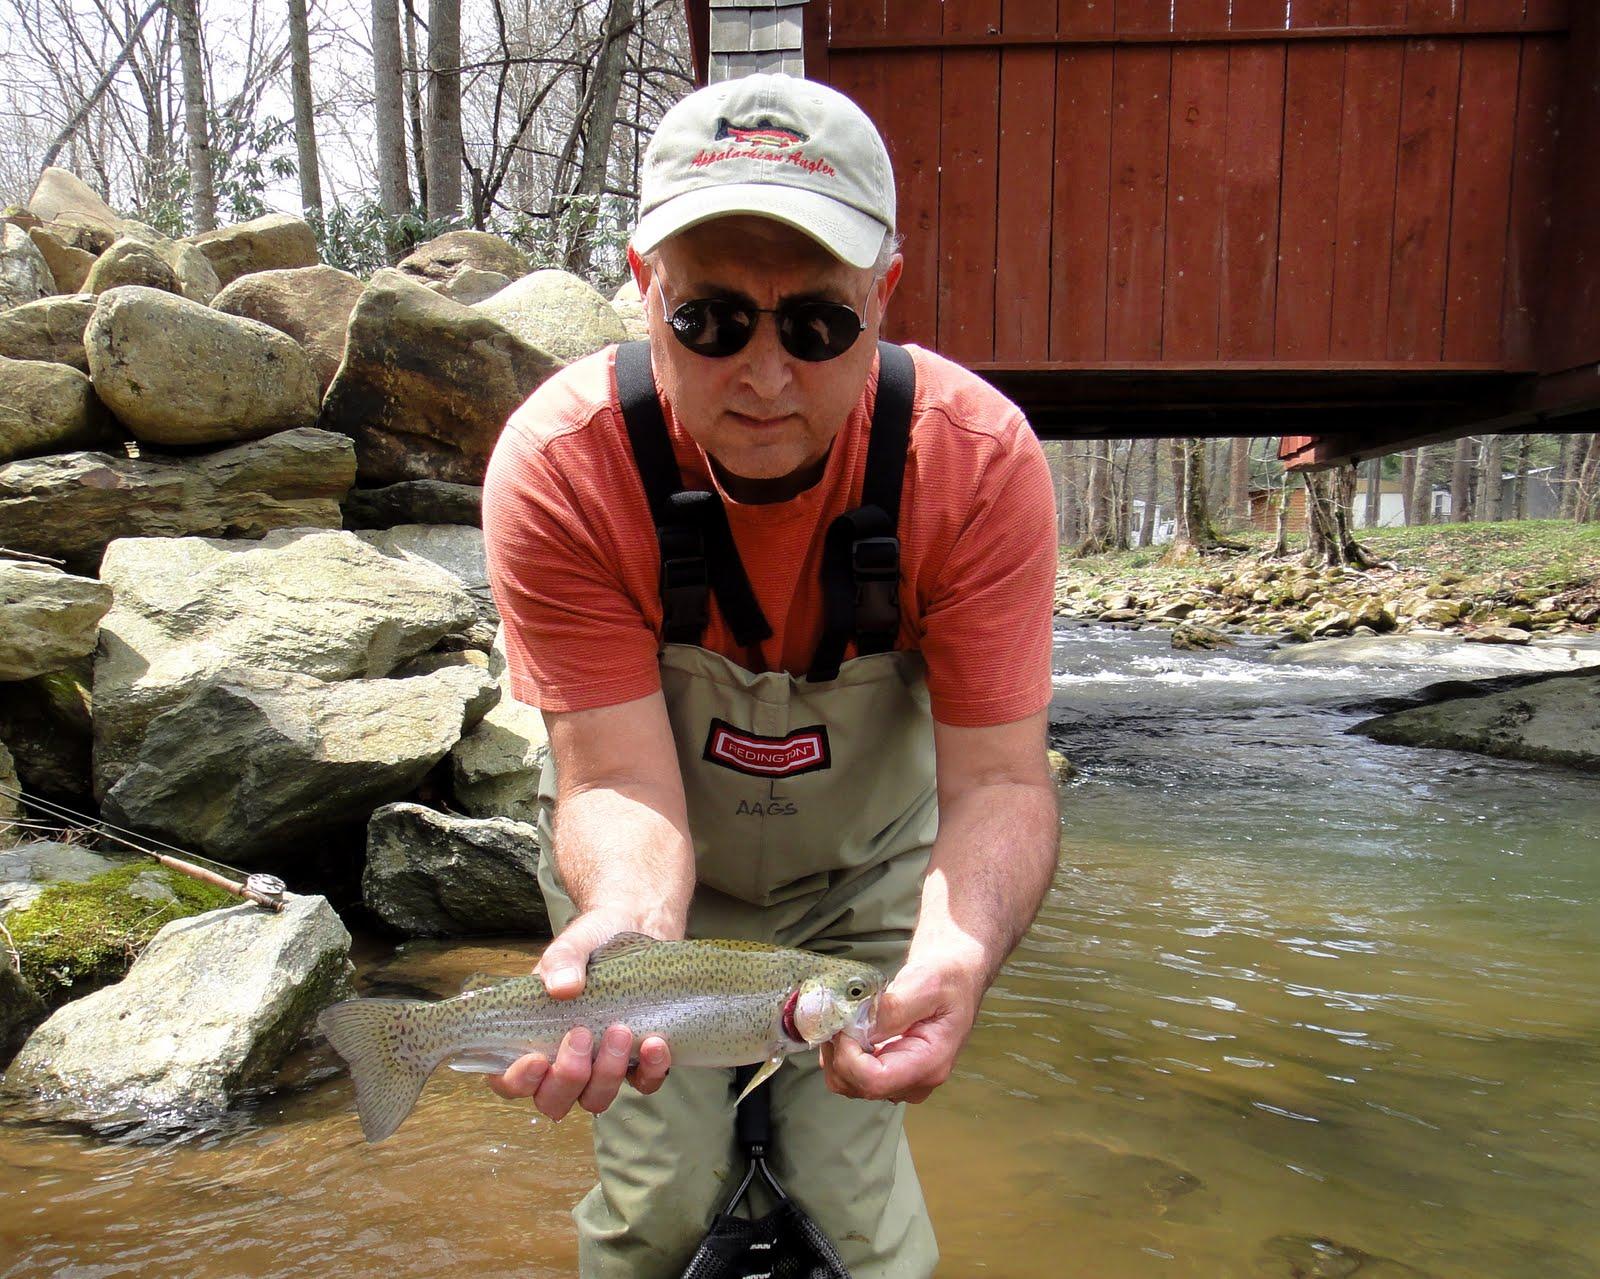 Appalachian angler fishing report may 5 appalachian angler for Oklahoma fishing report from anglers